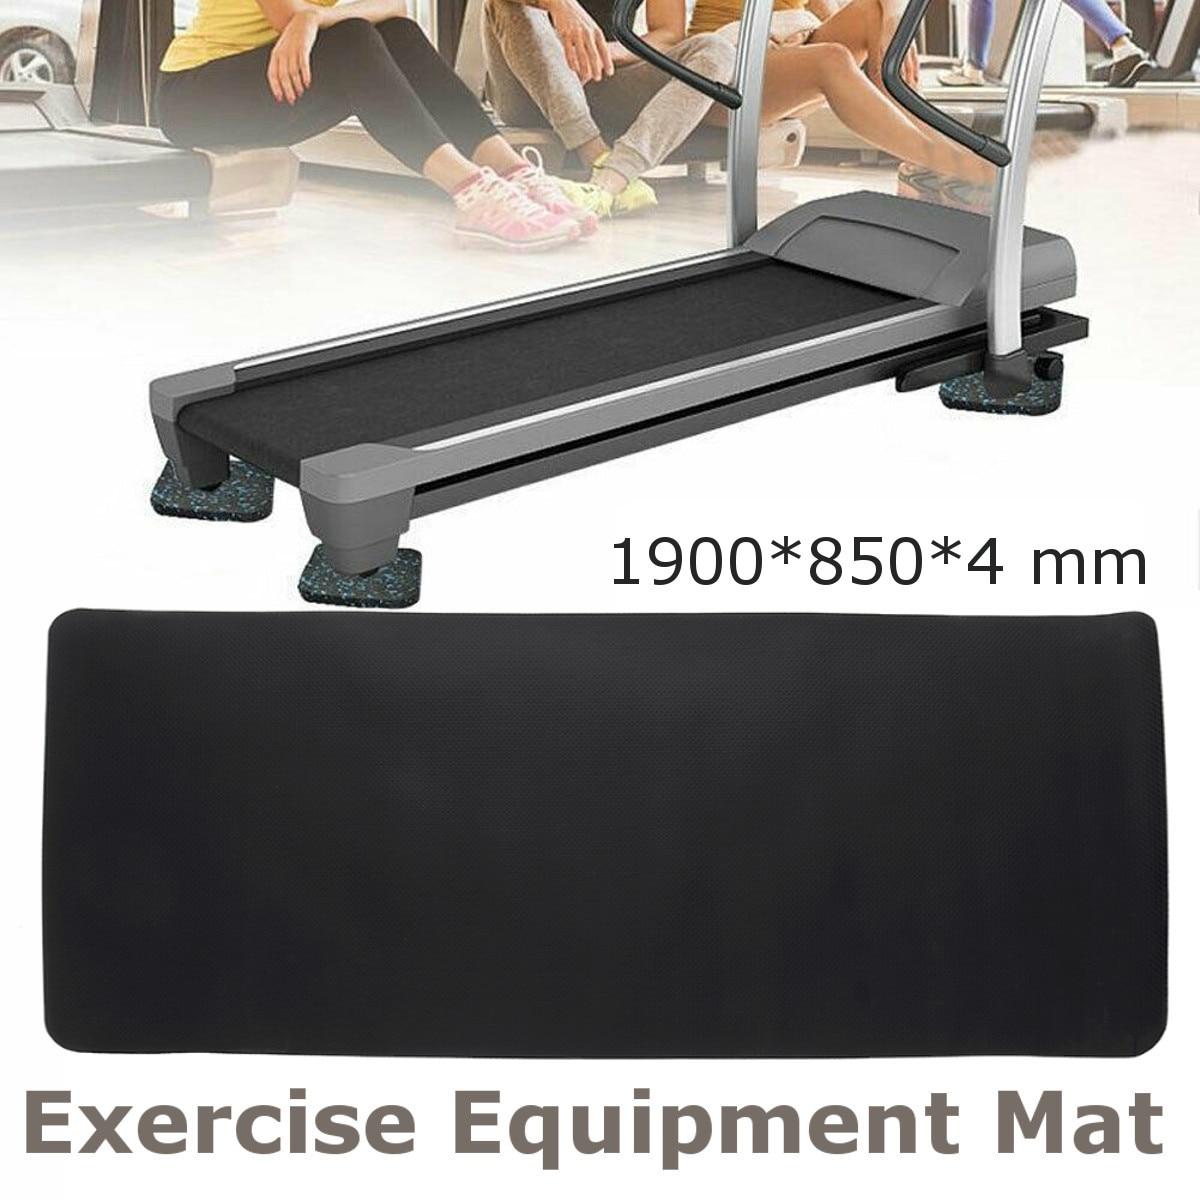 190x85cm NBR Exercise Mat Gym Fitness Equipment For Treadmill Bike Protect Floor Mat Running Machine Shock Absorbing Pad Black